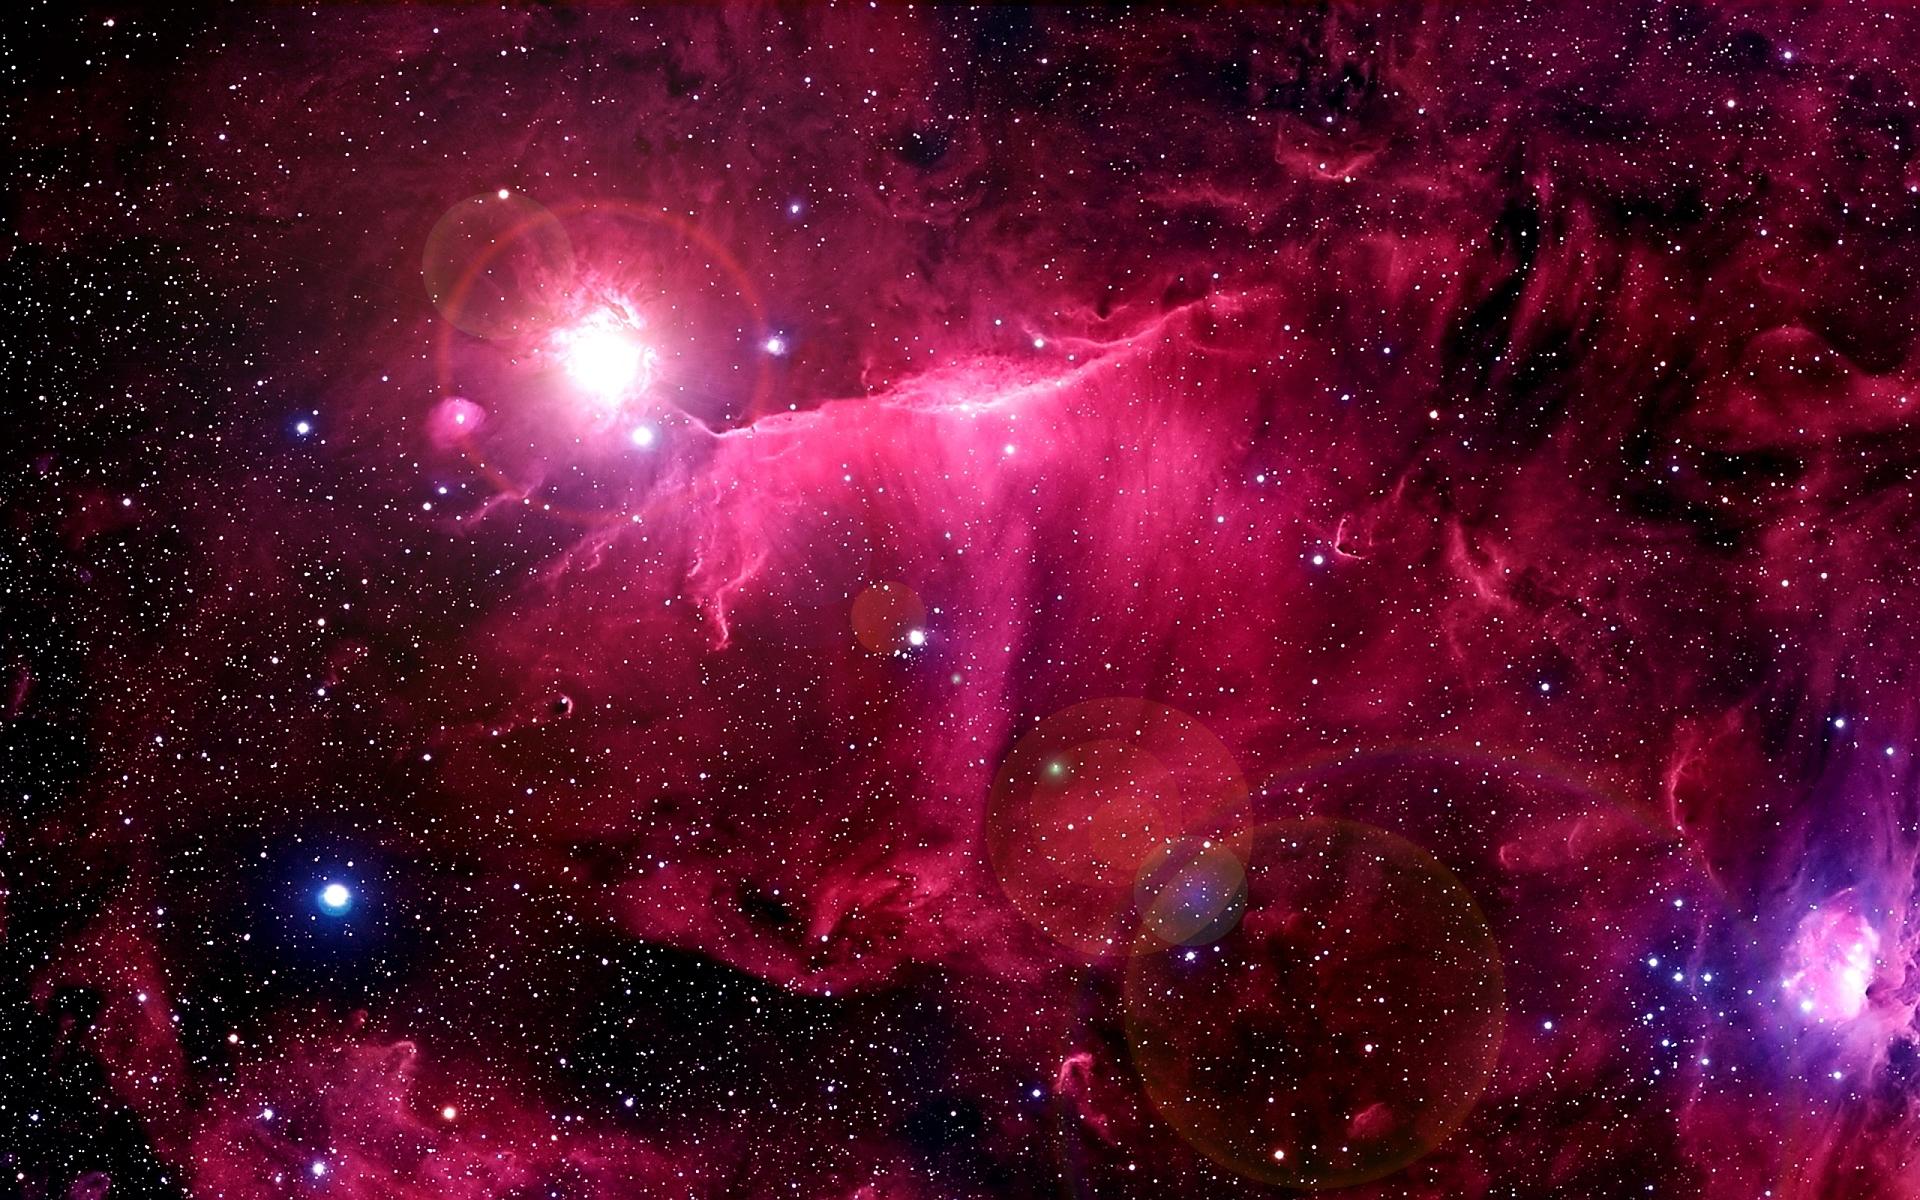 Space stars nebulae